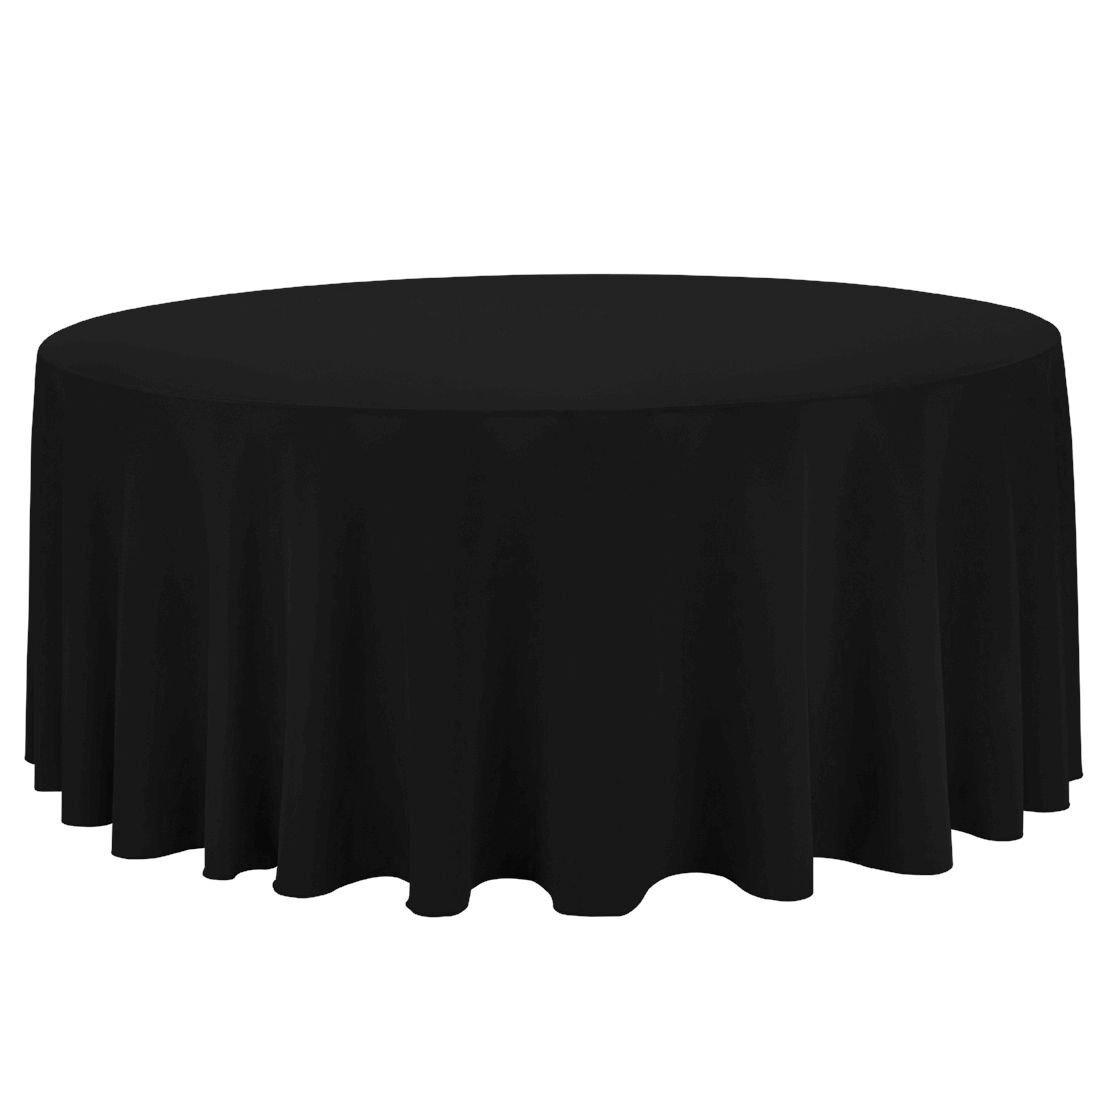 BLACK LINEN ROUND TABLECLOTH (3.3 M DIA.)  $20+GST